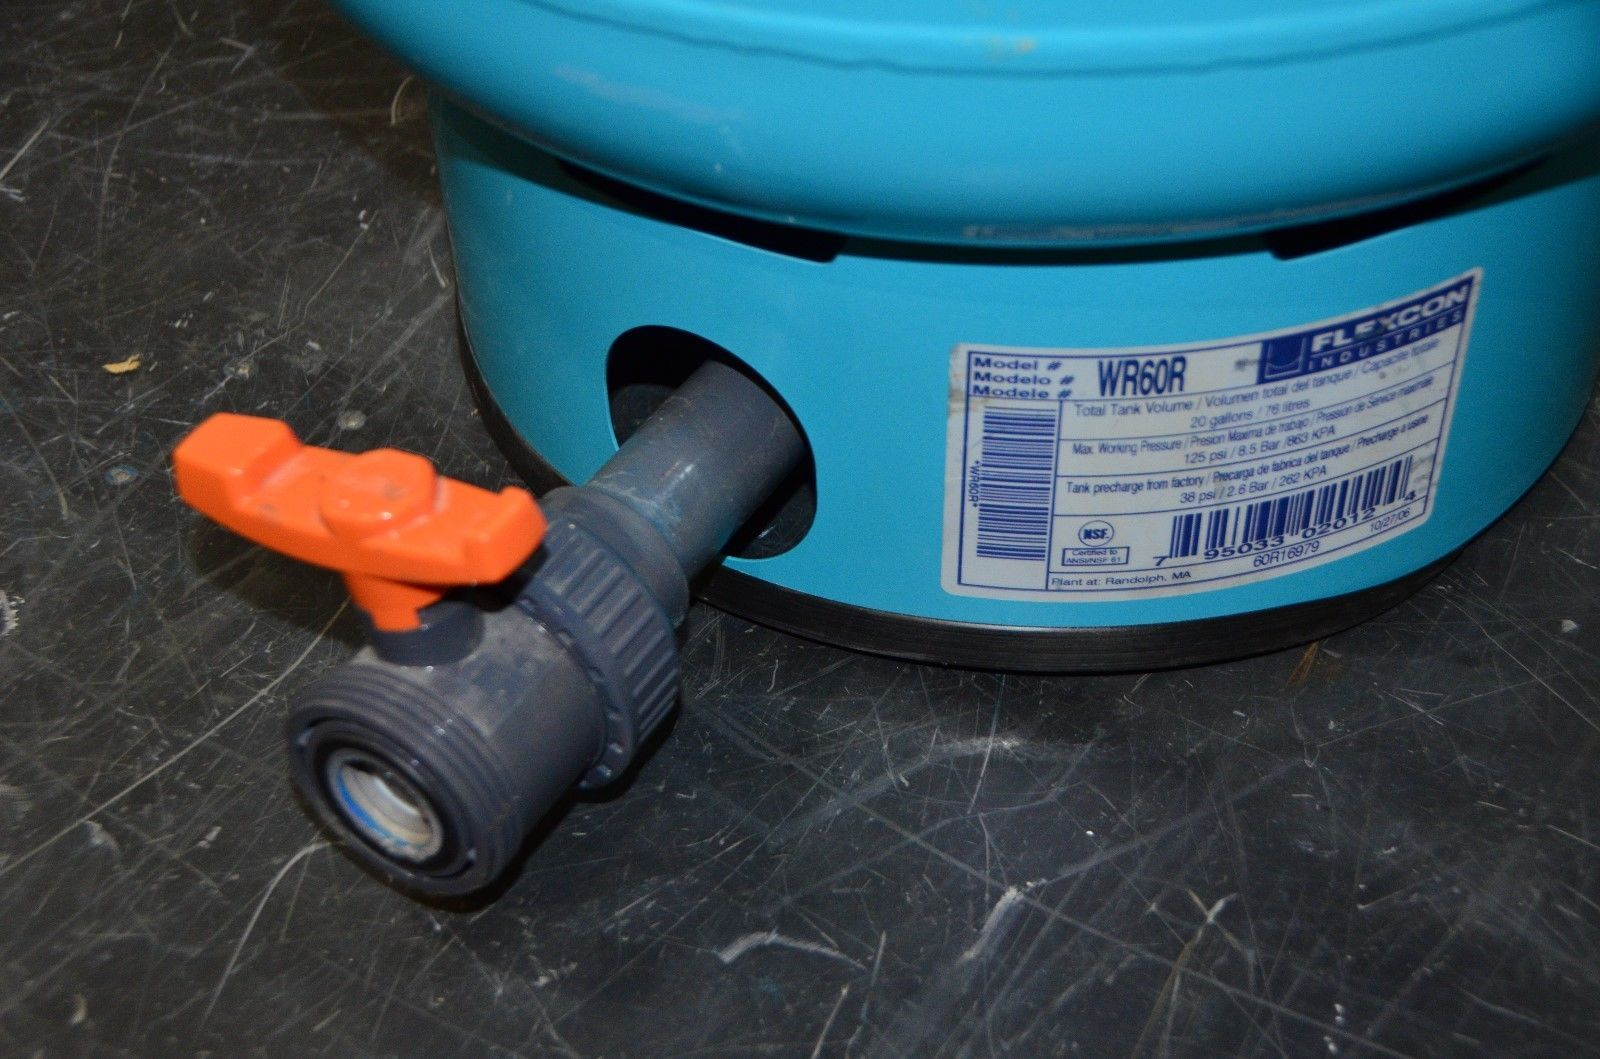 Flexcon Well-Rite WR60R Well Pressure Tank 20 Gallon Steel